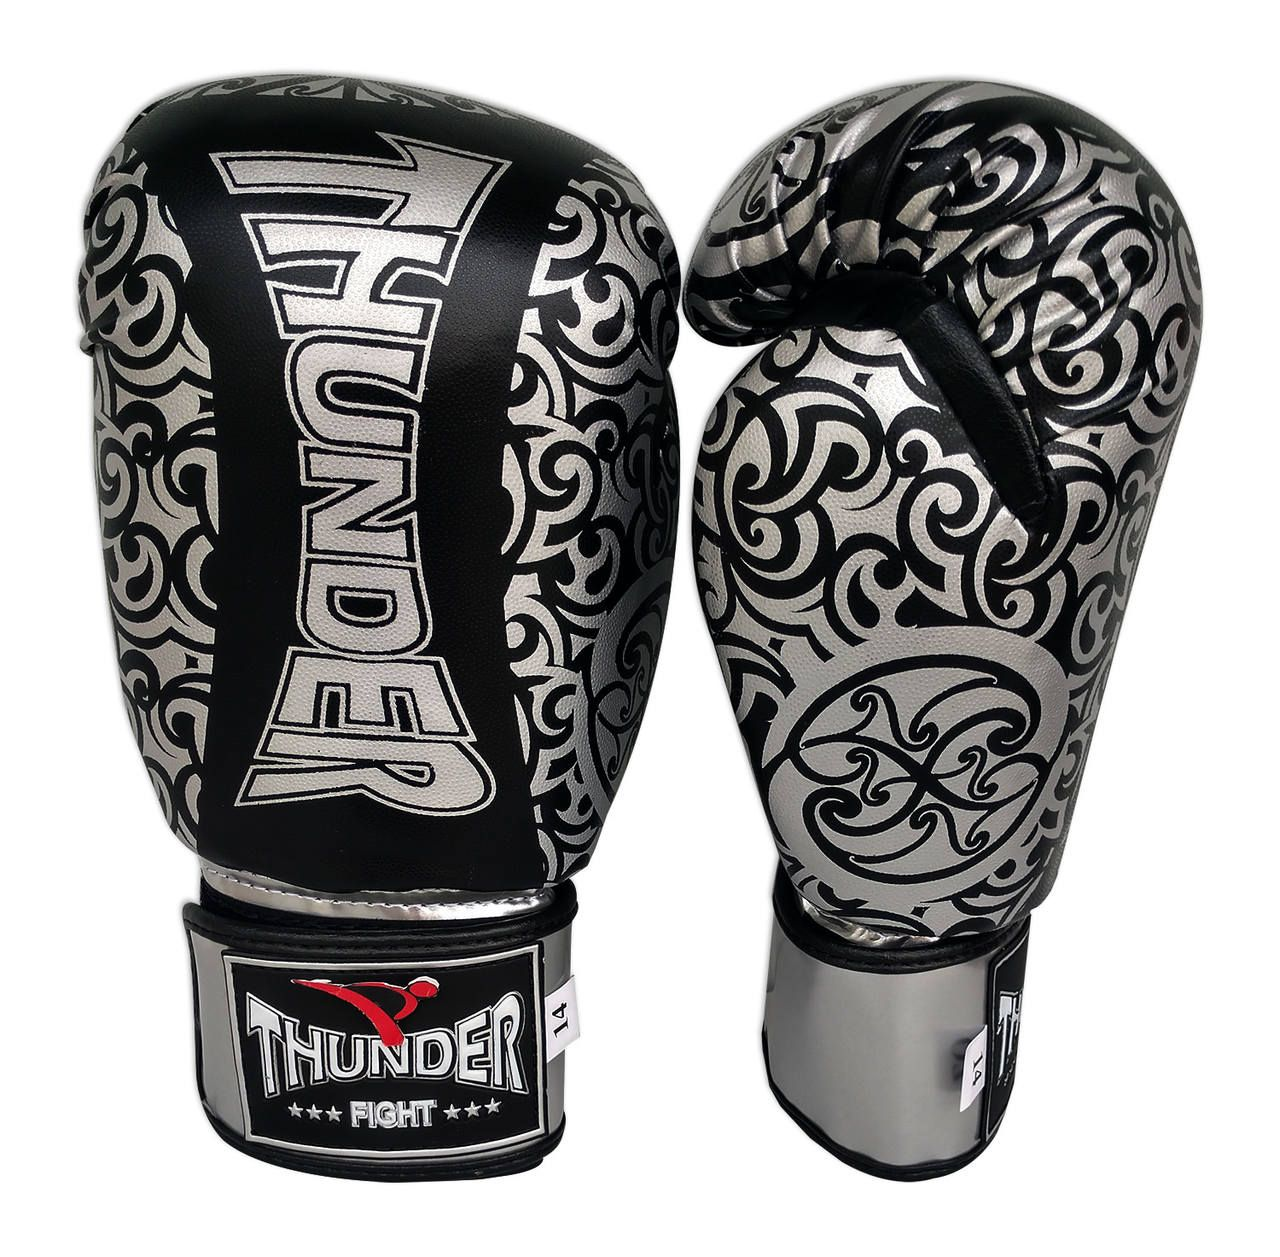 Luva de Boxe / Muay Thai 14oz - Preto Com Prata Maori - Thunder Fight  - PRALUTA SHOP